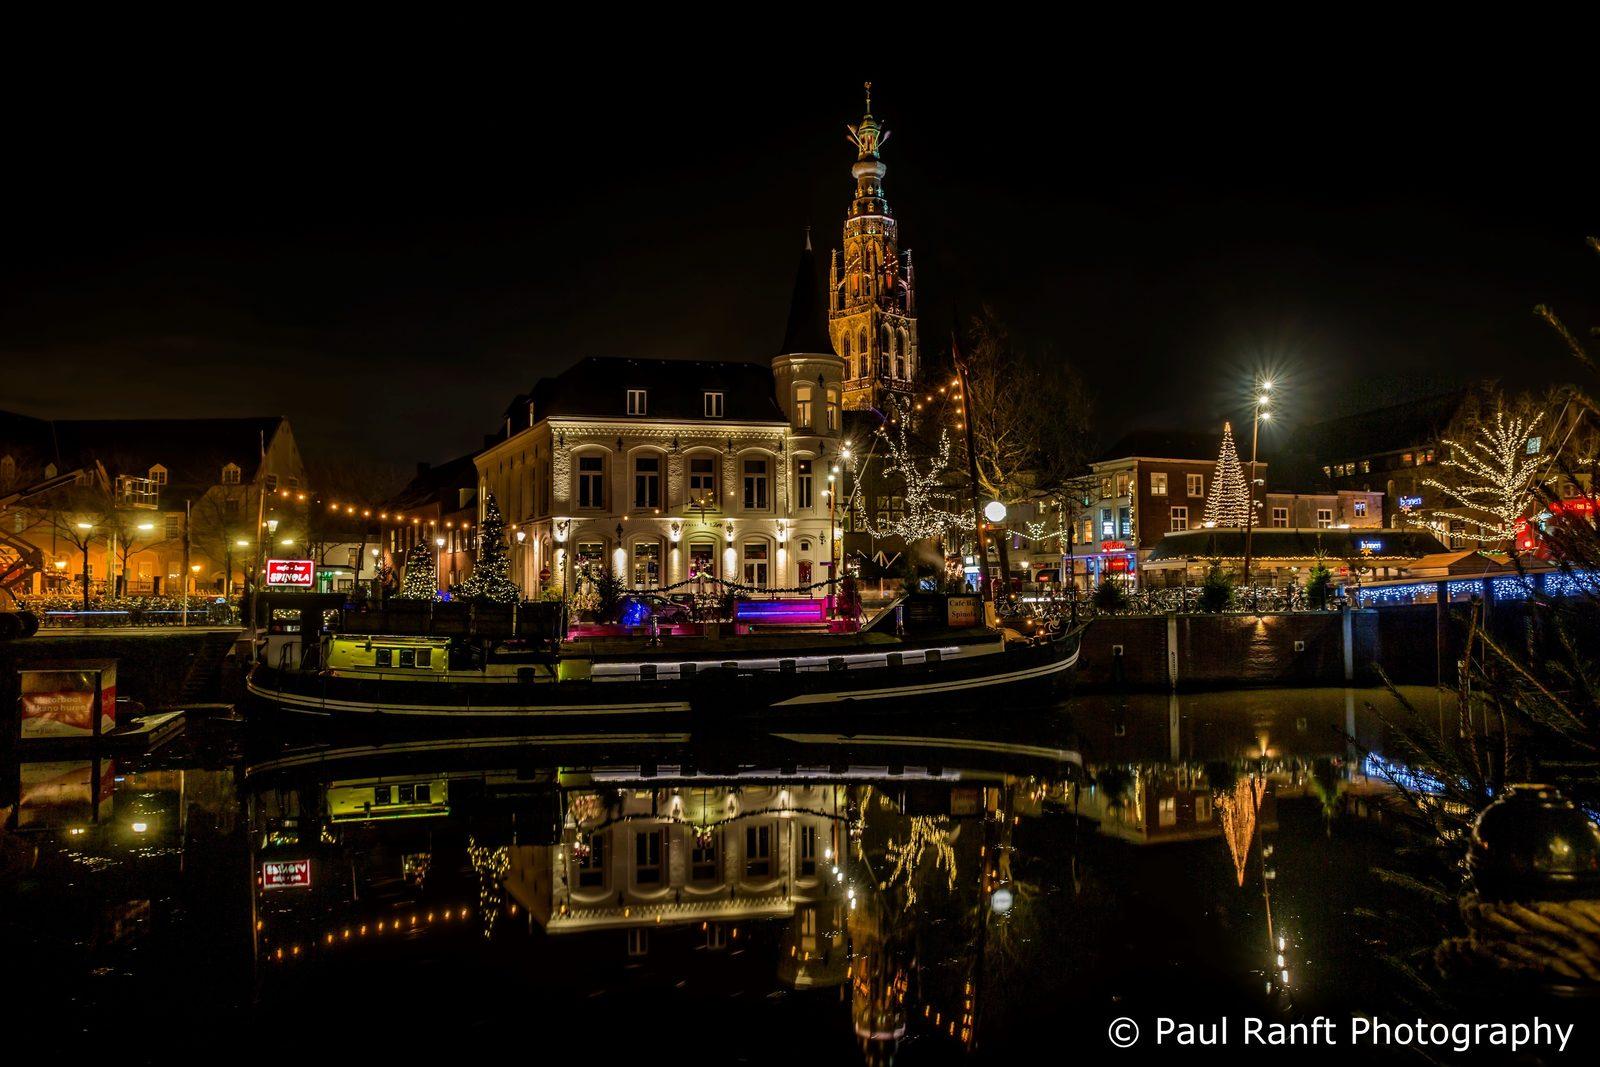 Breda by night, Paul Ranft Photography